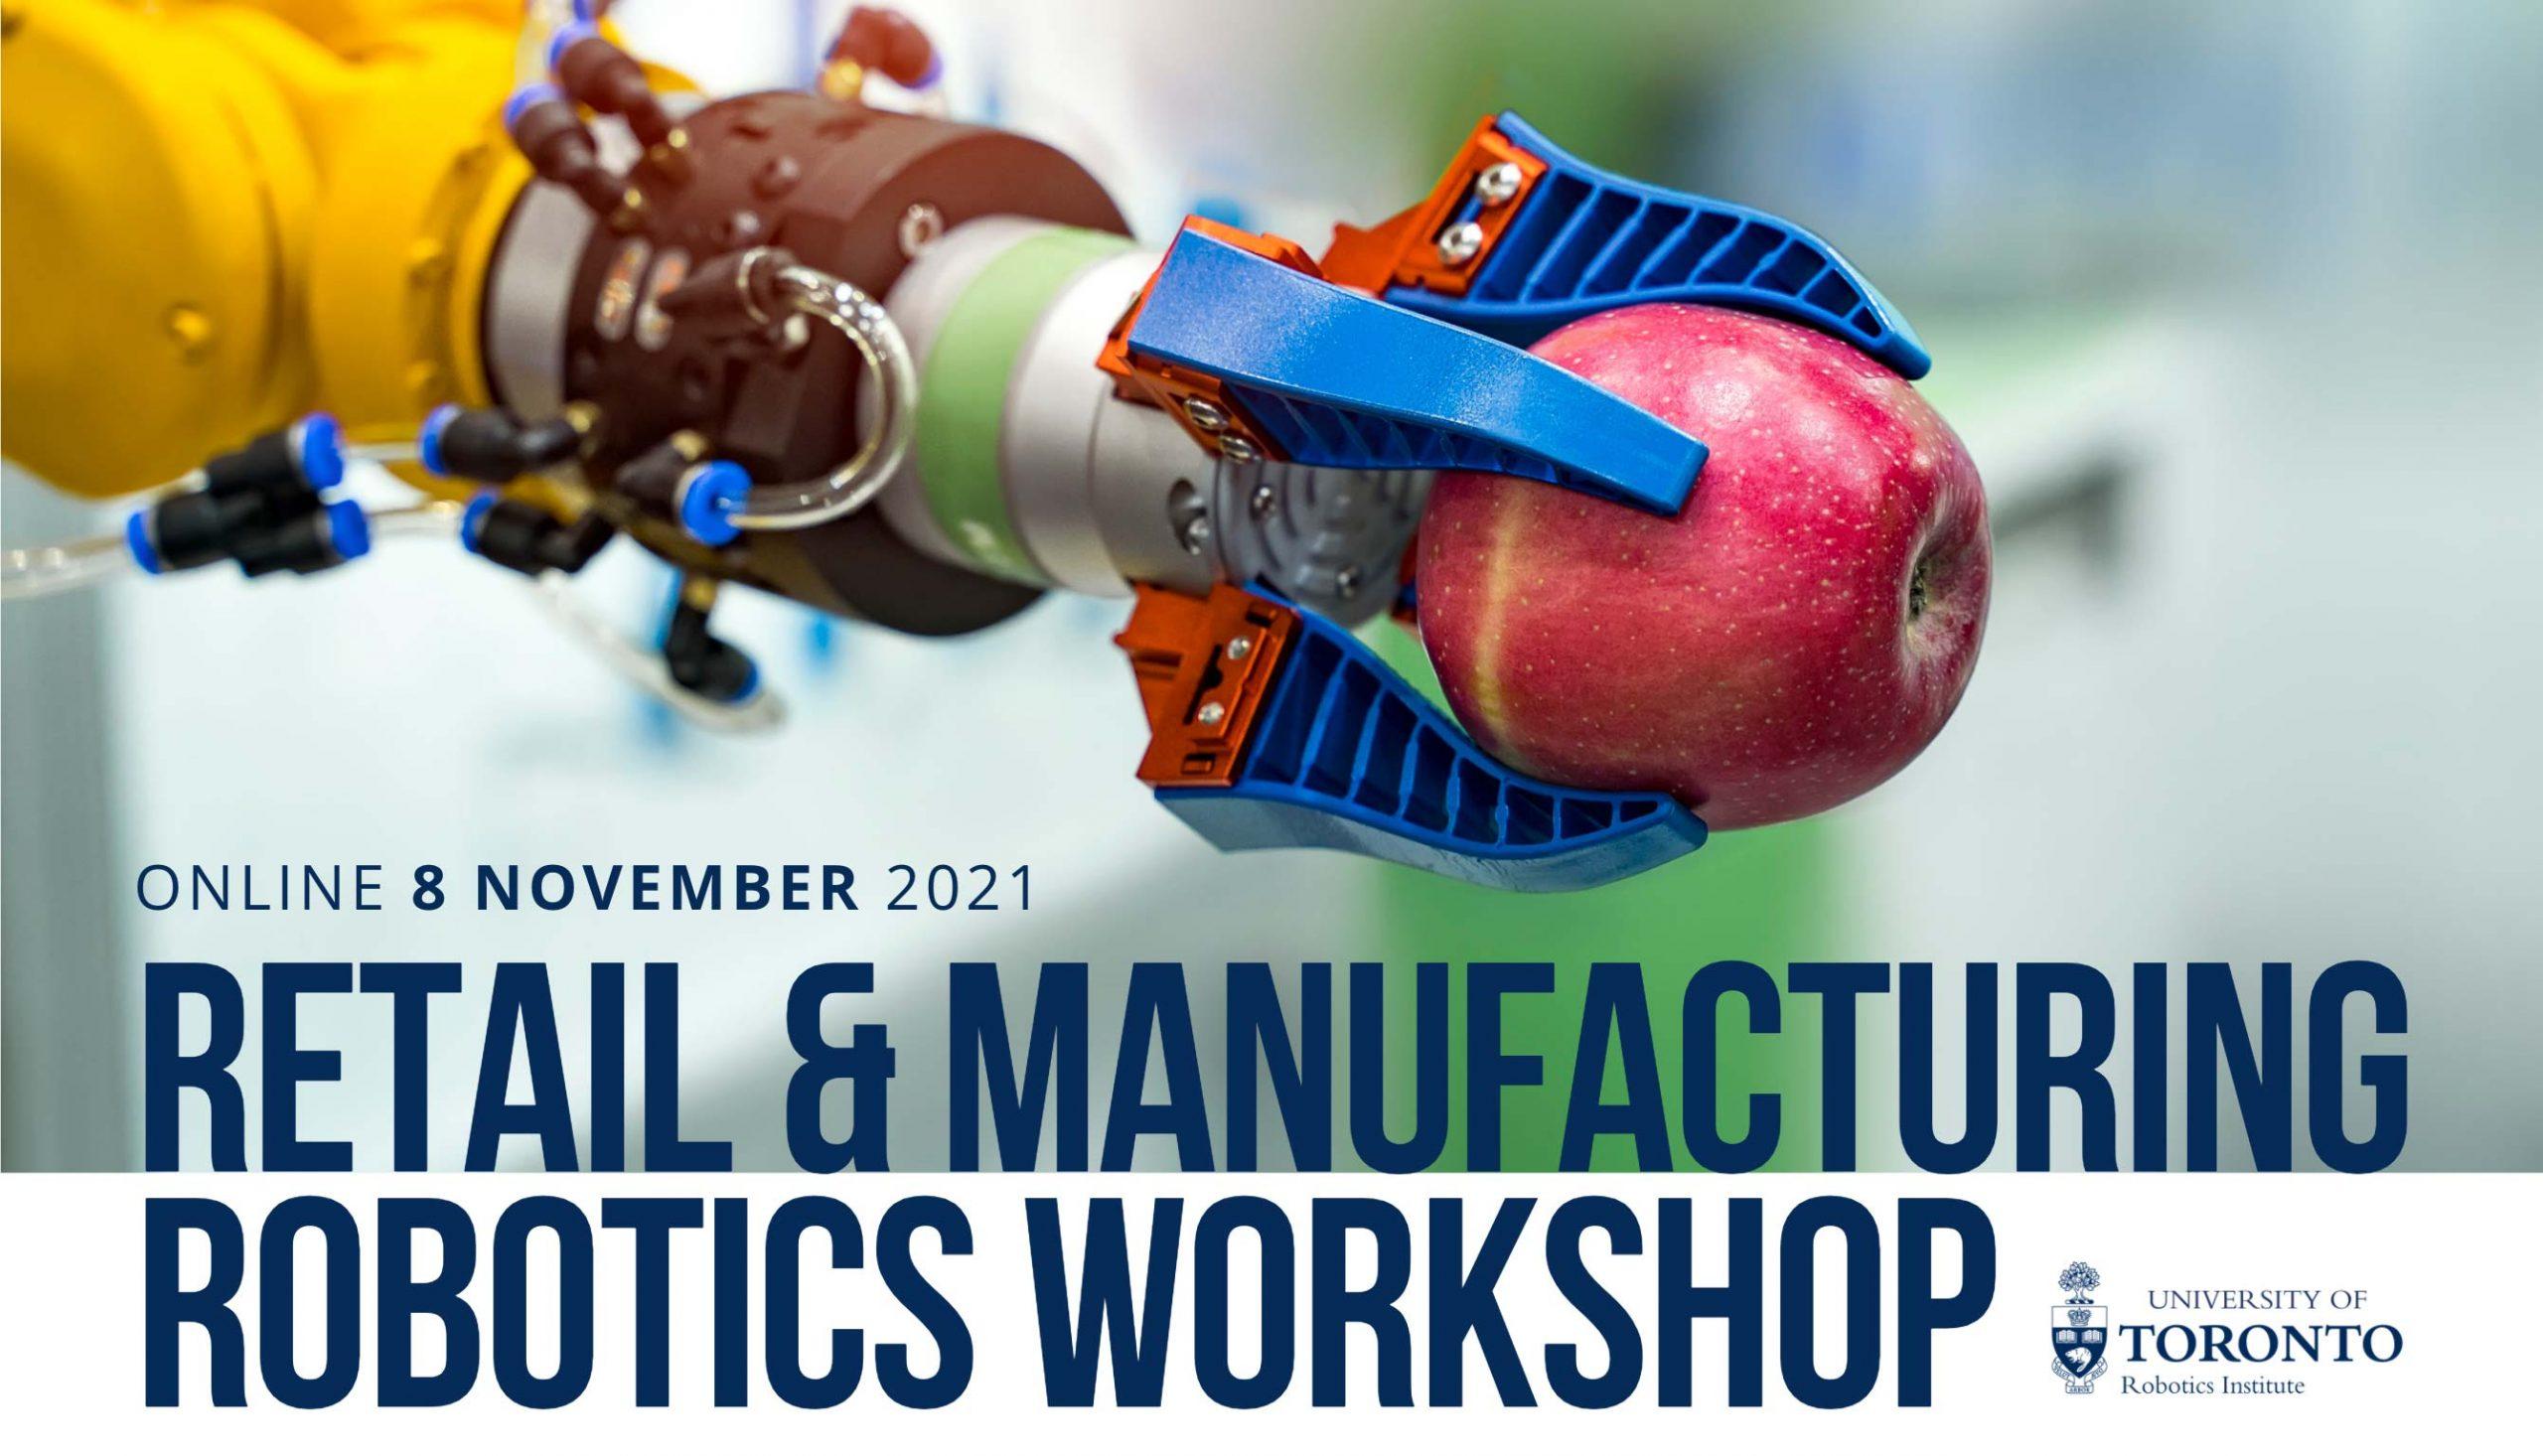 retail_manufacturing_robotics_Workshop_UofT